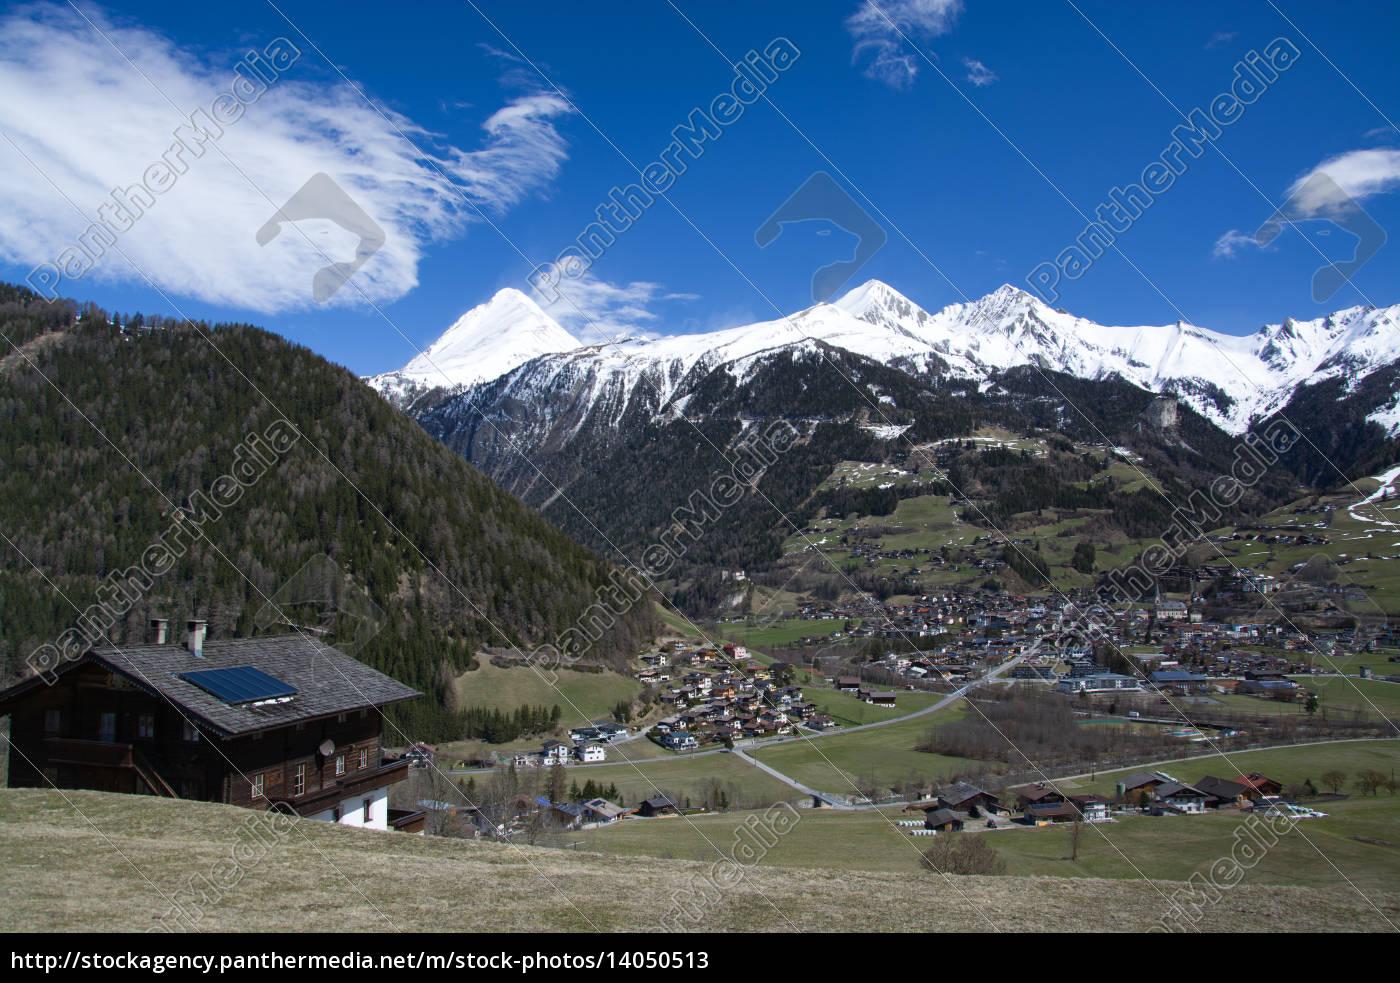 martei, east, tyrol, austria - 14050513